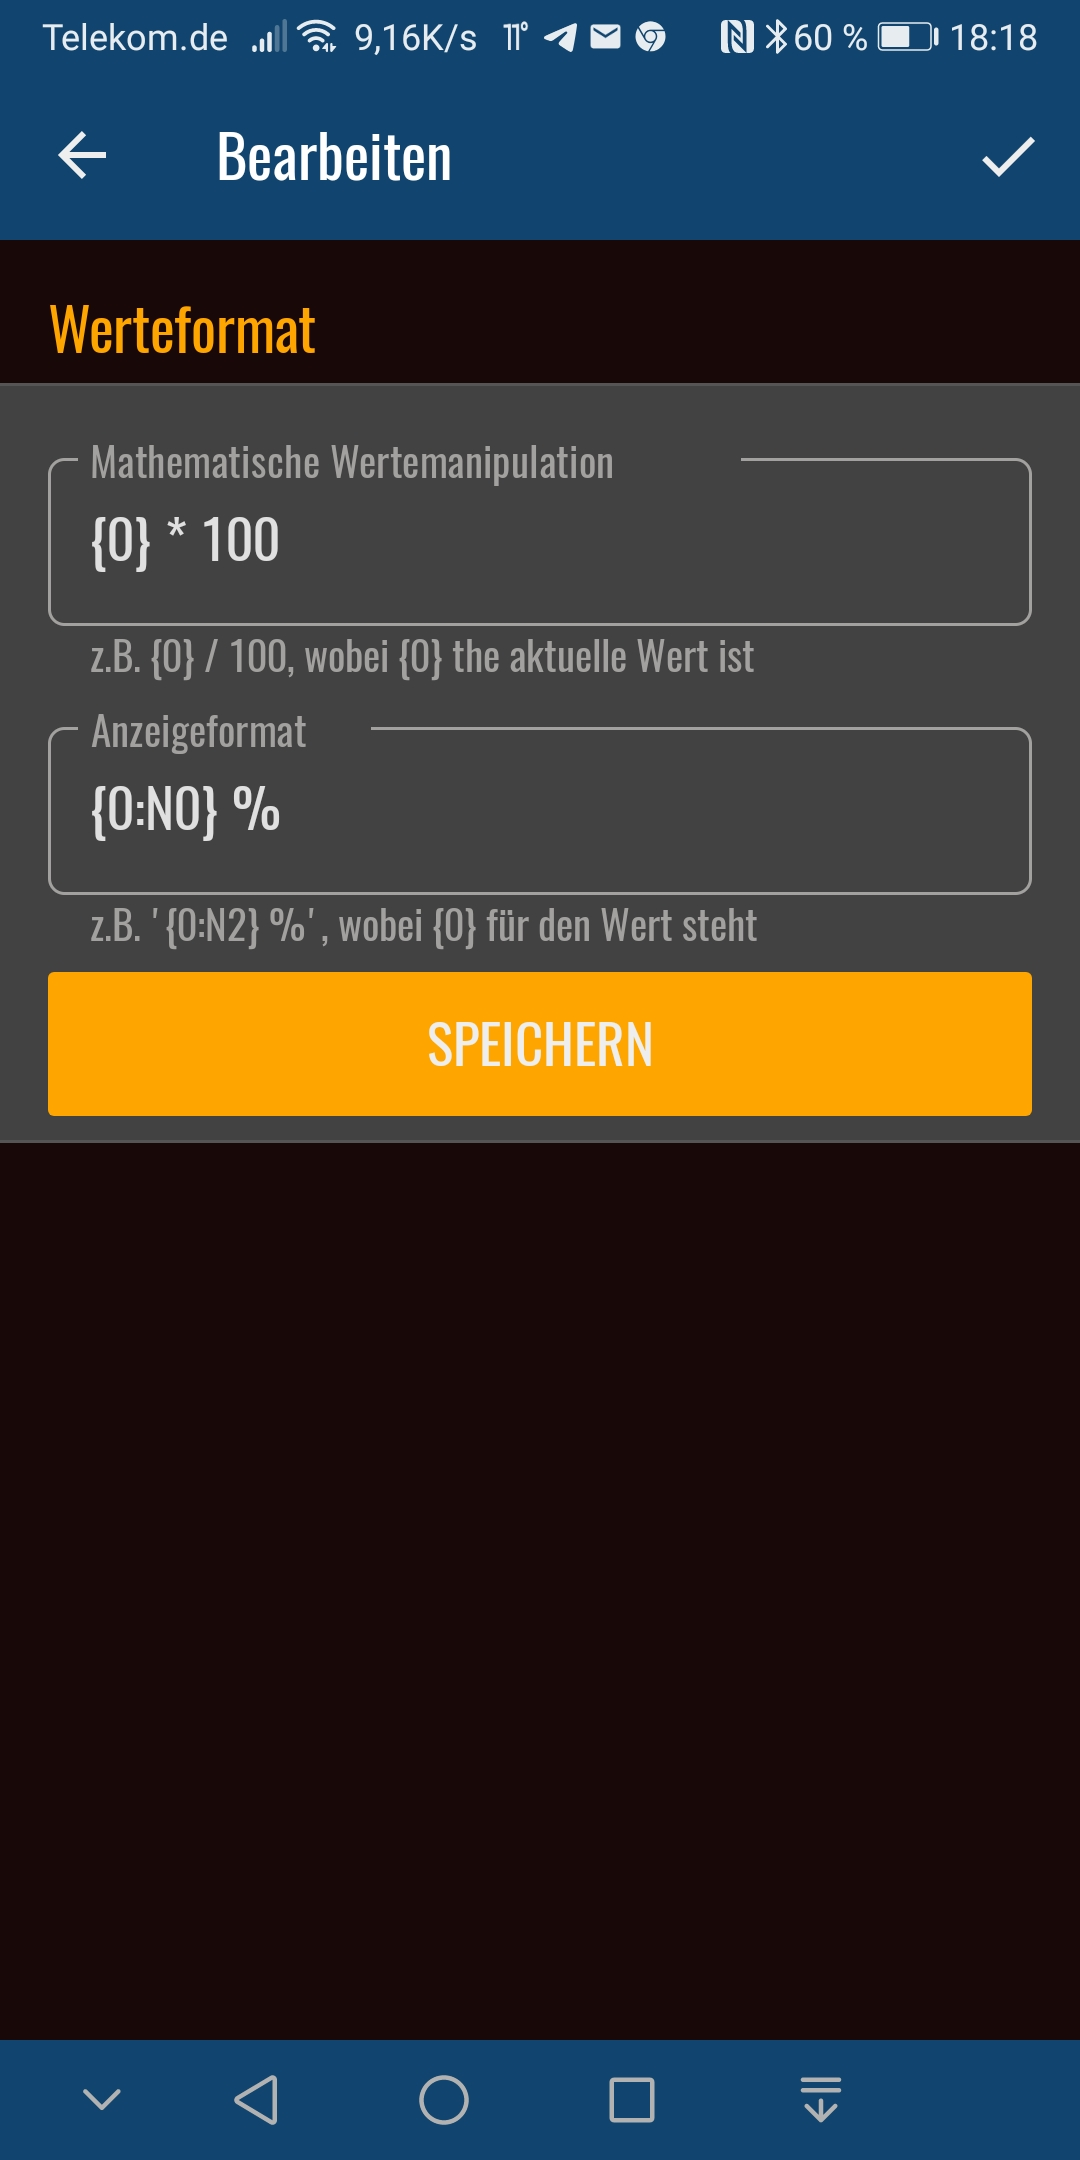 Screenshot_20201027_181819_com.easysmarthome.cloudmaticapp